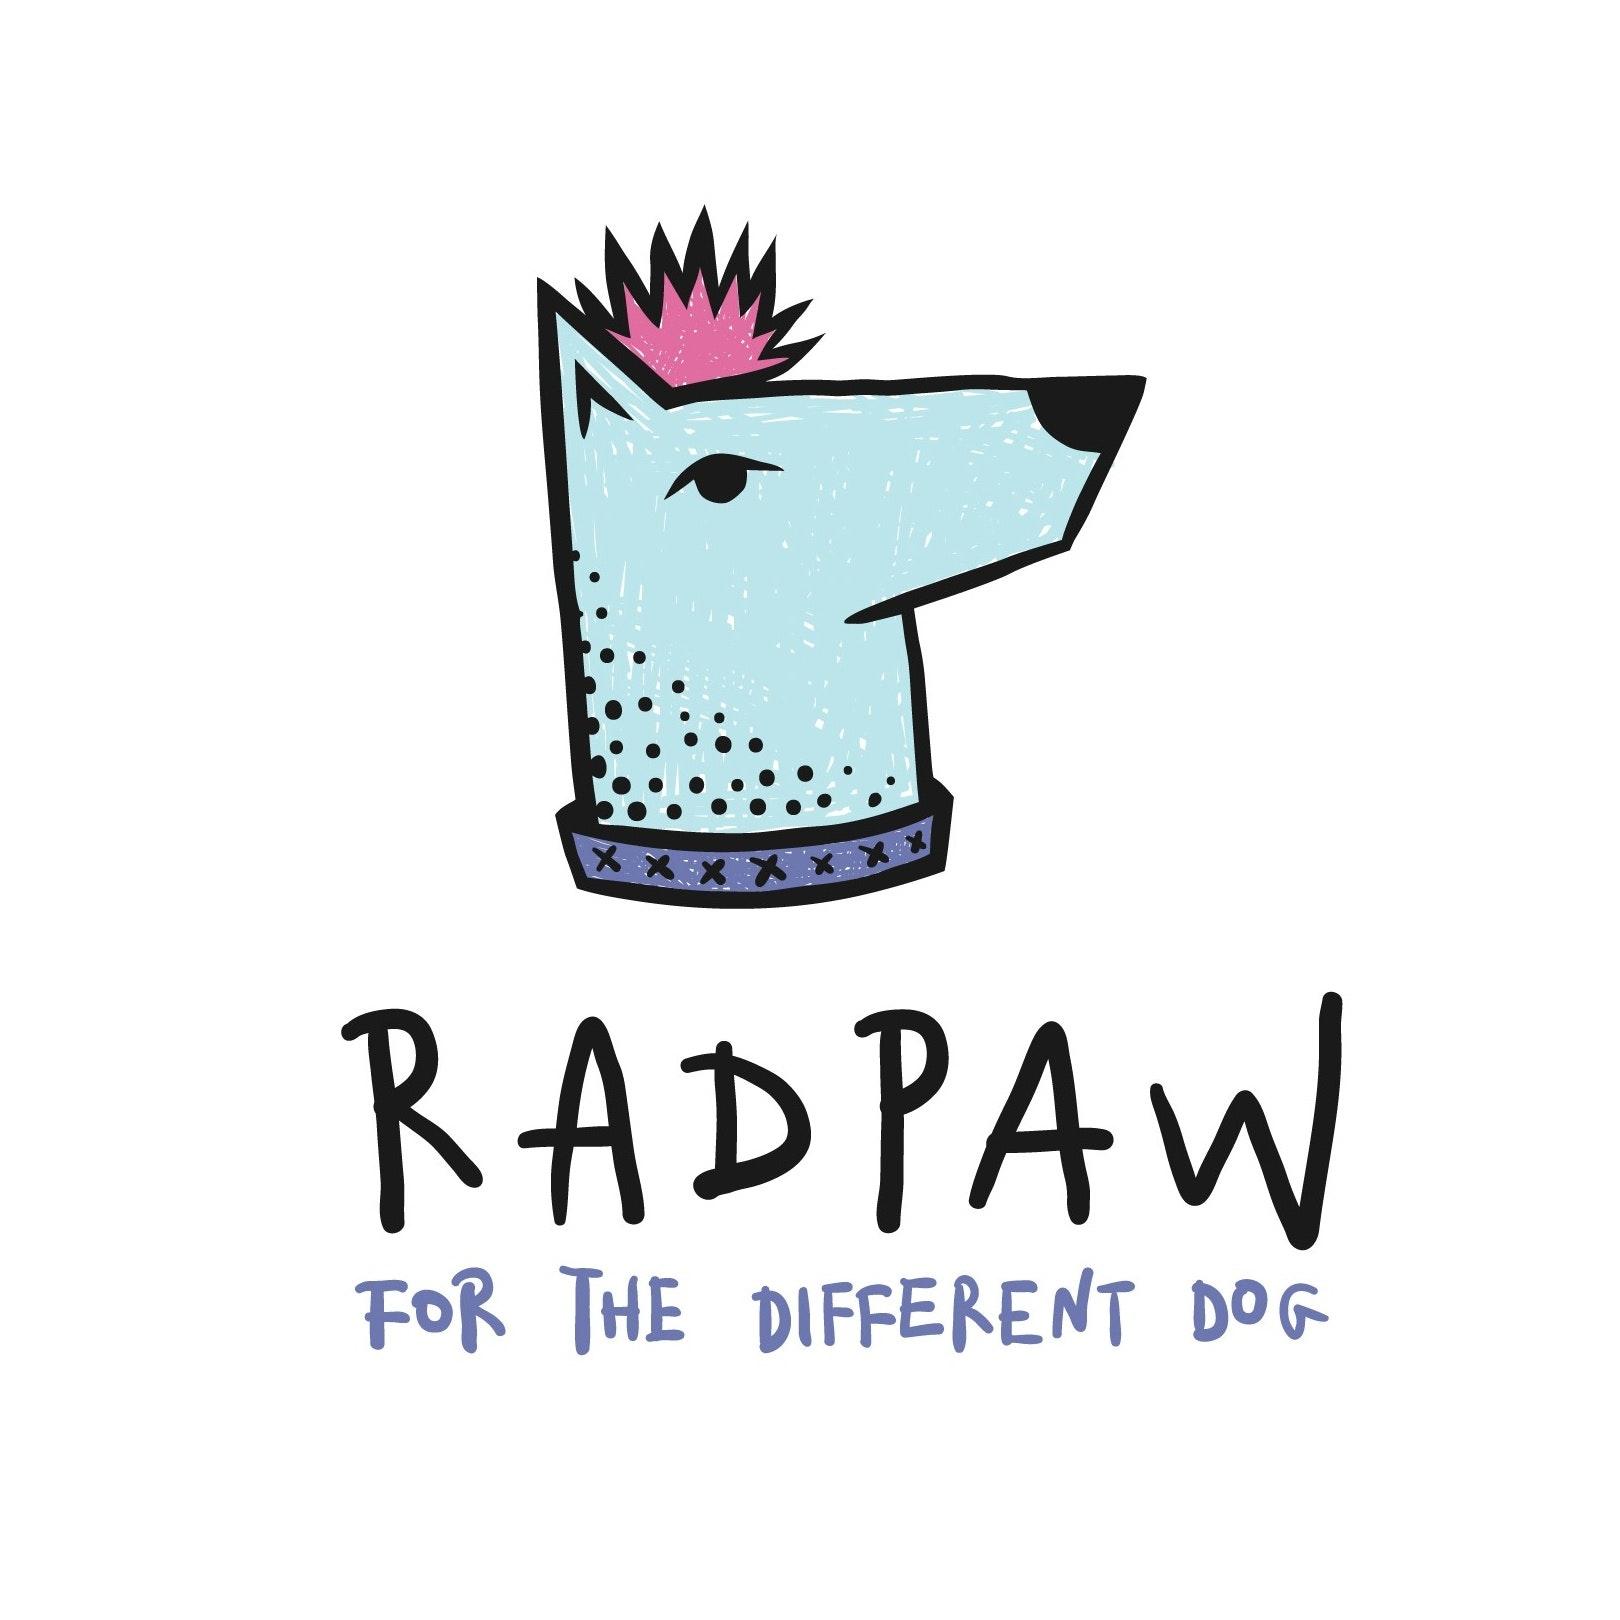 Radpaw logo design